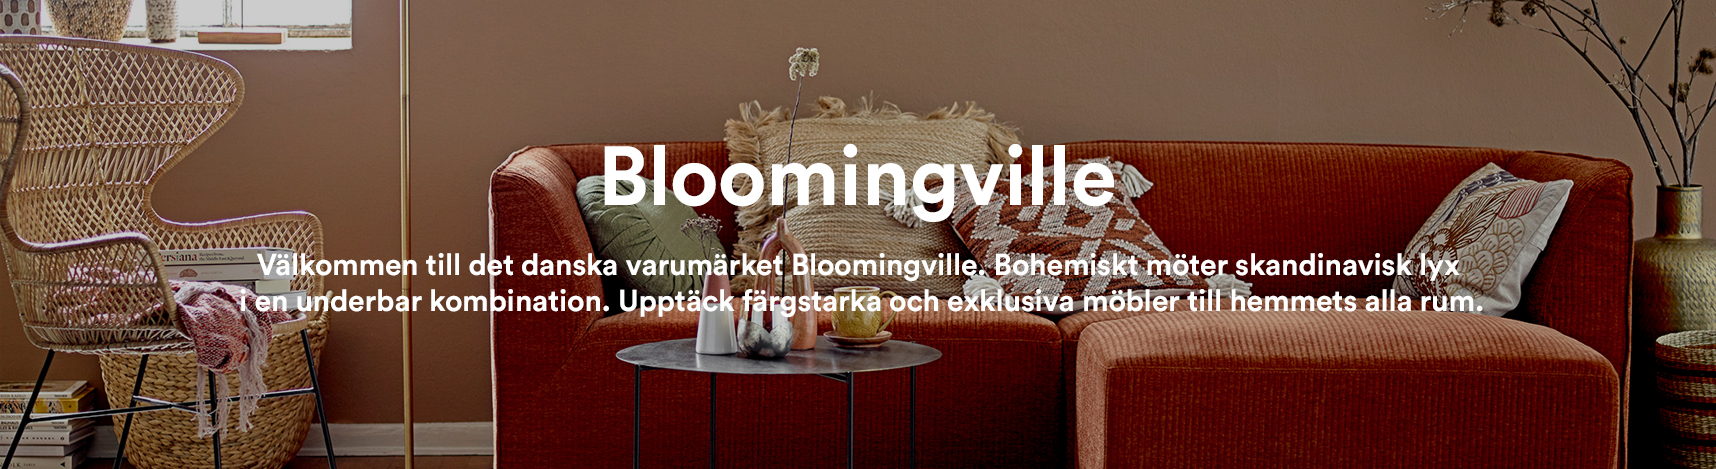 bloomingville återförsäljare göteborg